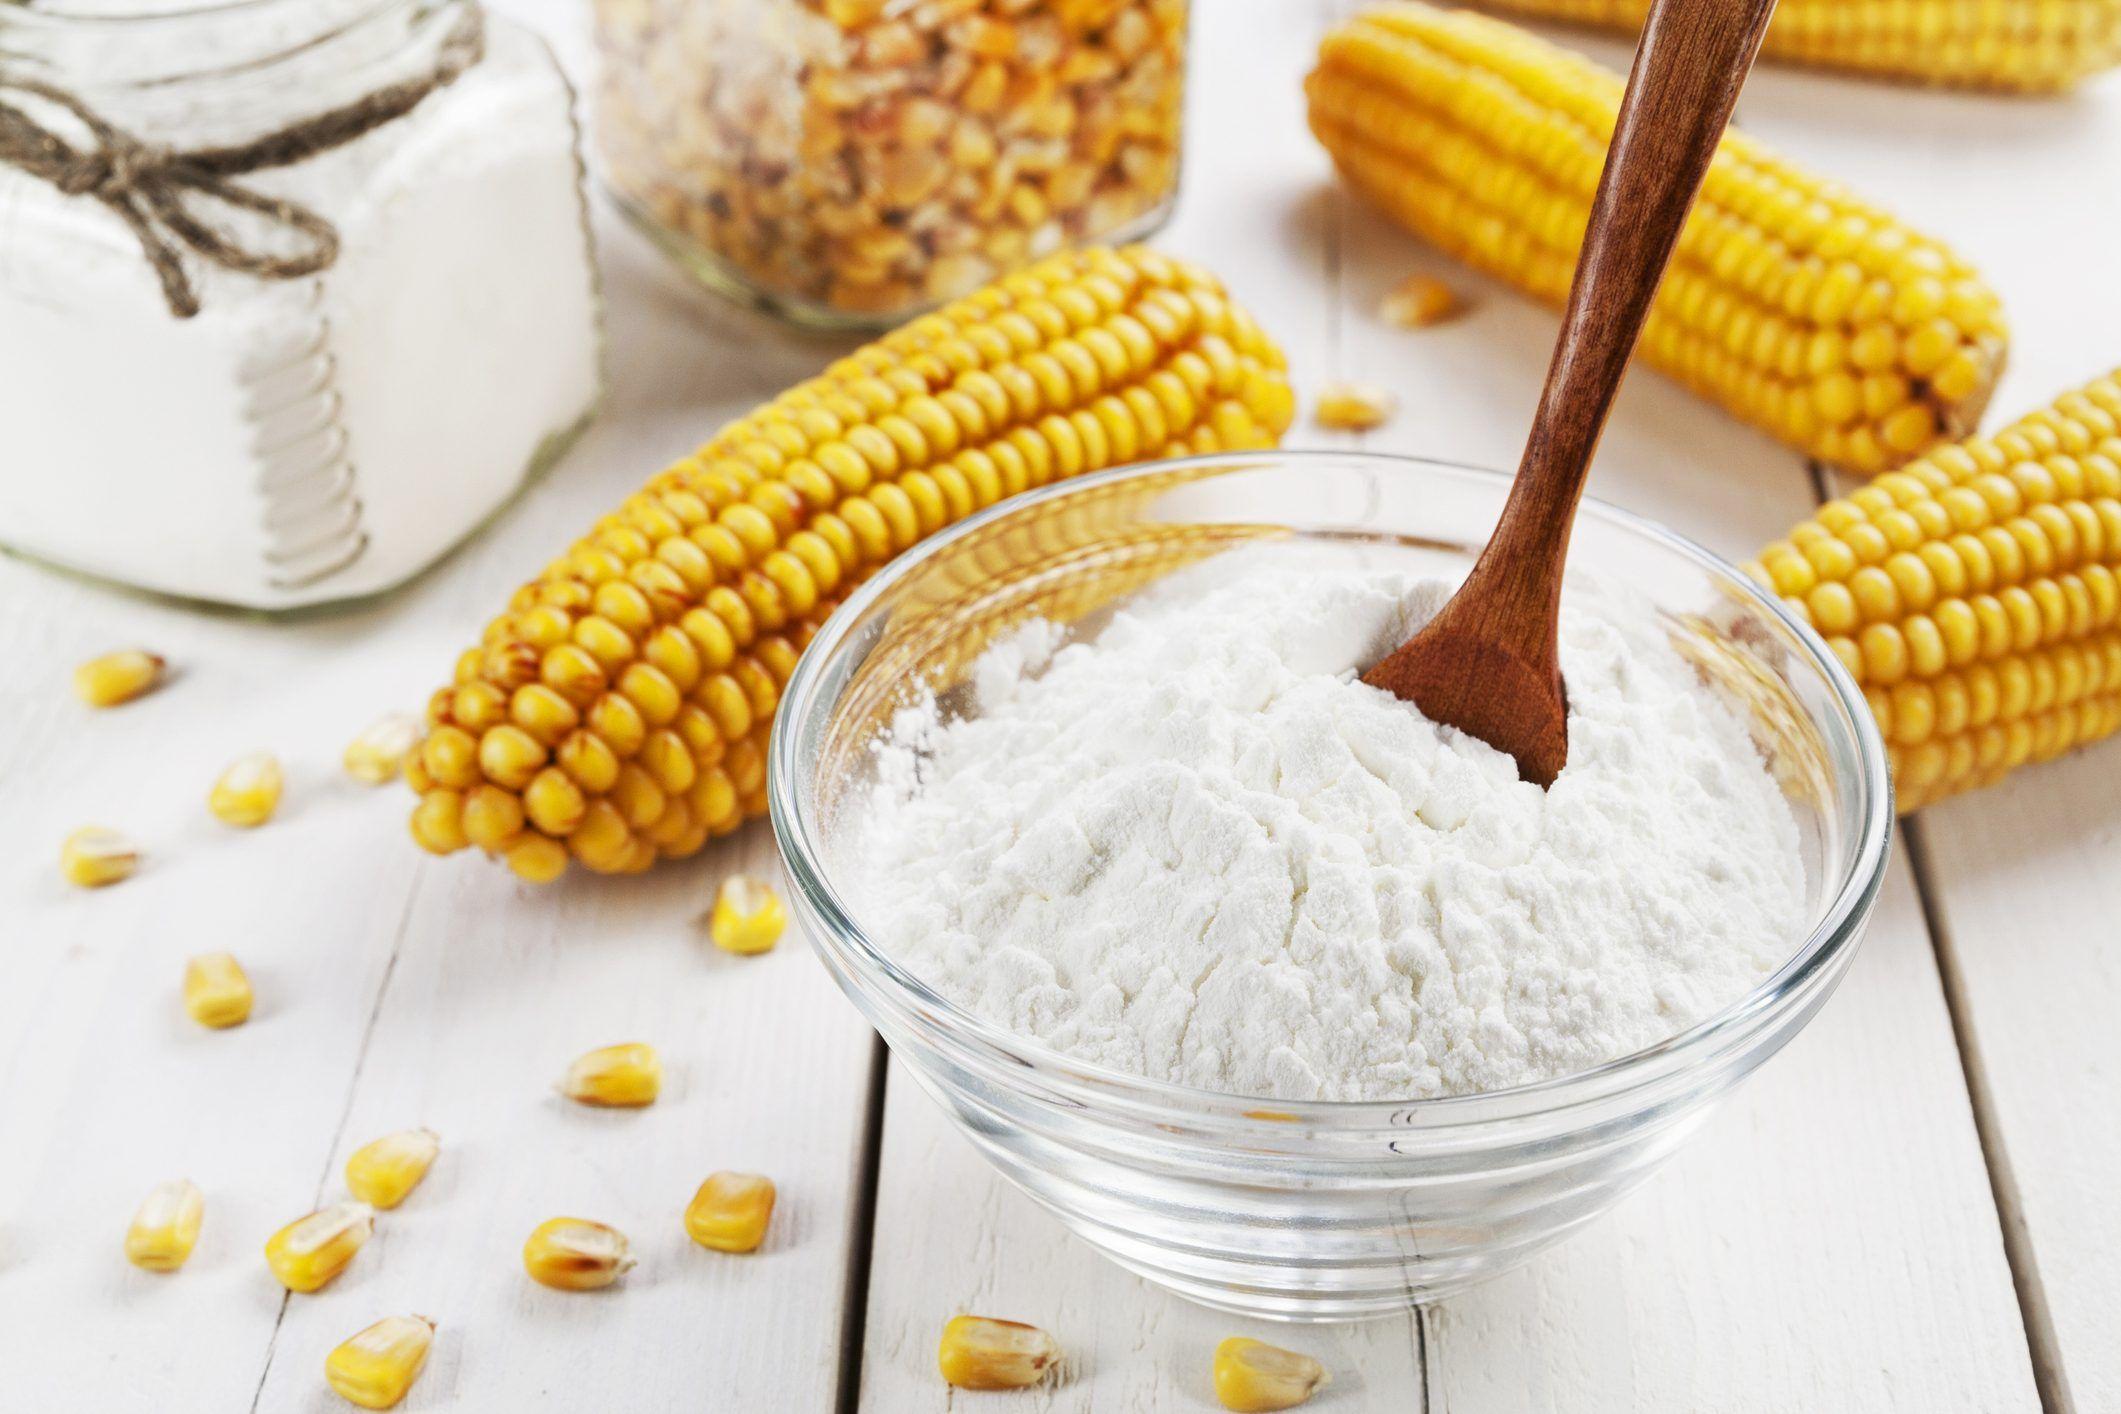 Cornstarch: characteristics and uses of cornstarch | Cookist.com | Corn  starch, Cornmeal, How to make tortillas